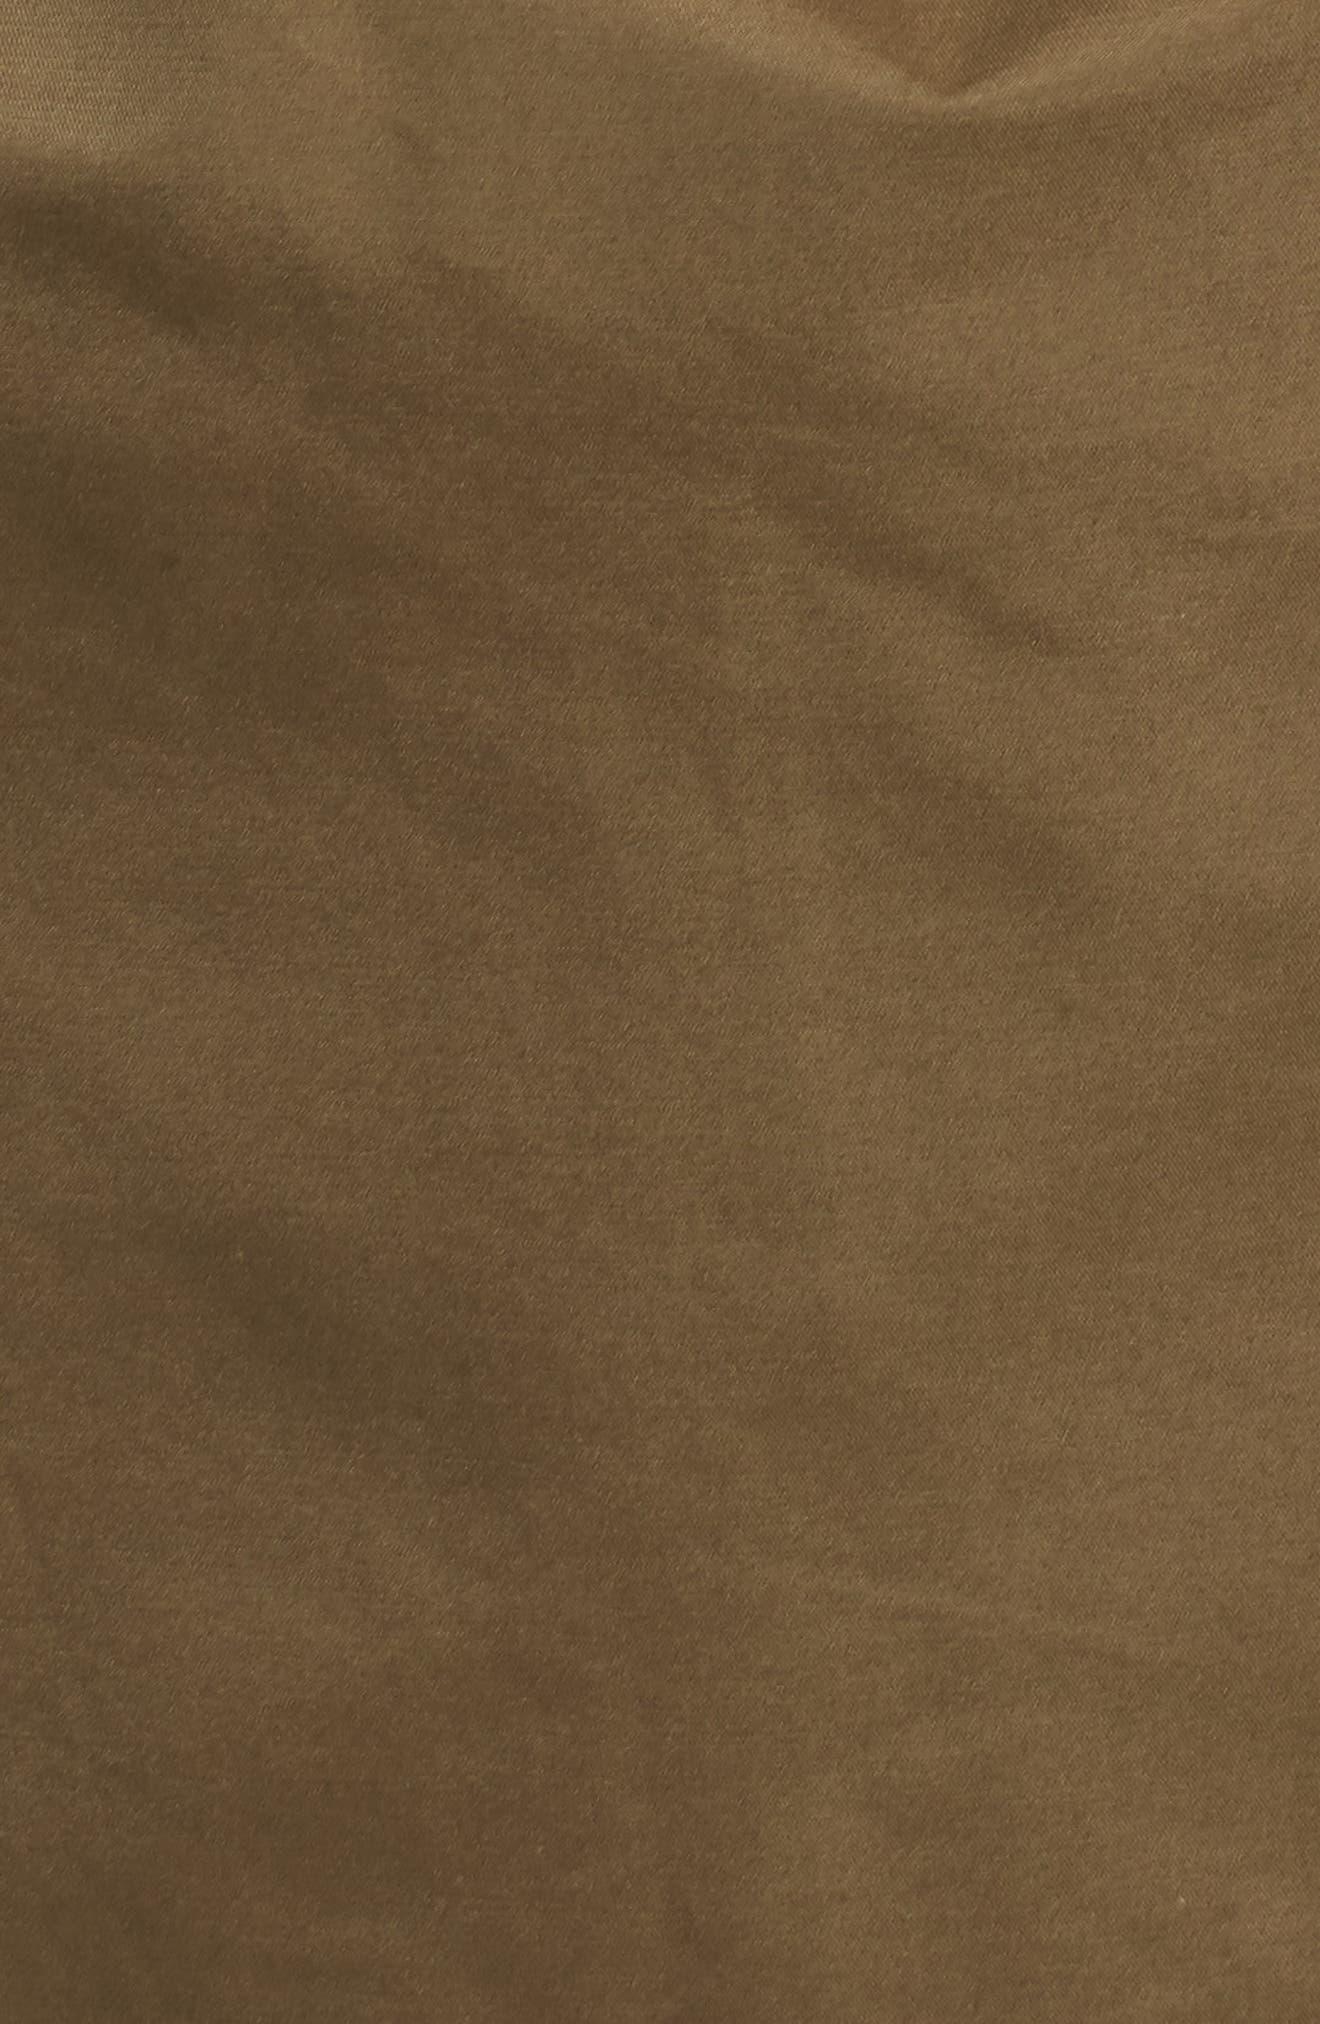 Taylor Utility Jacket,                             Alternate thumbnail 7, color,                             341